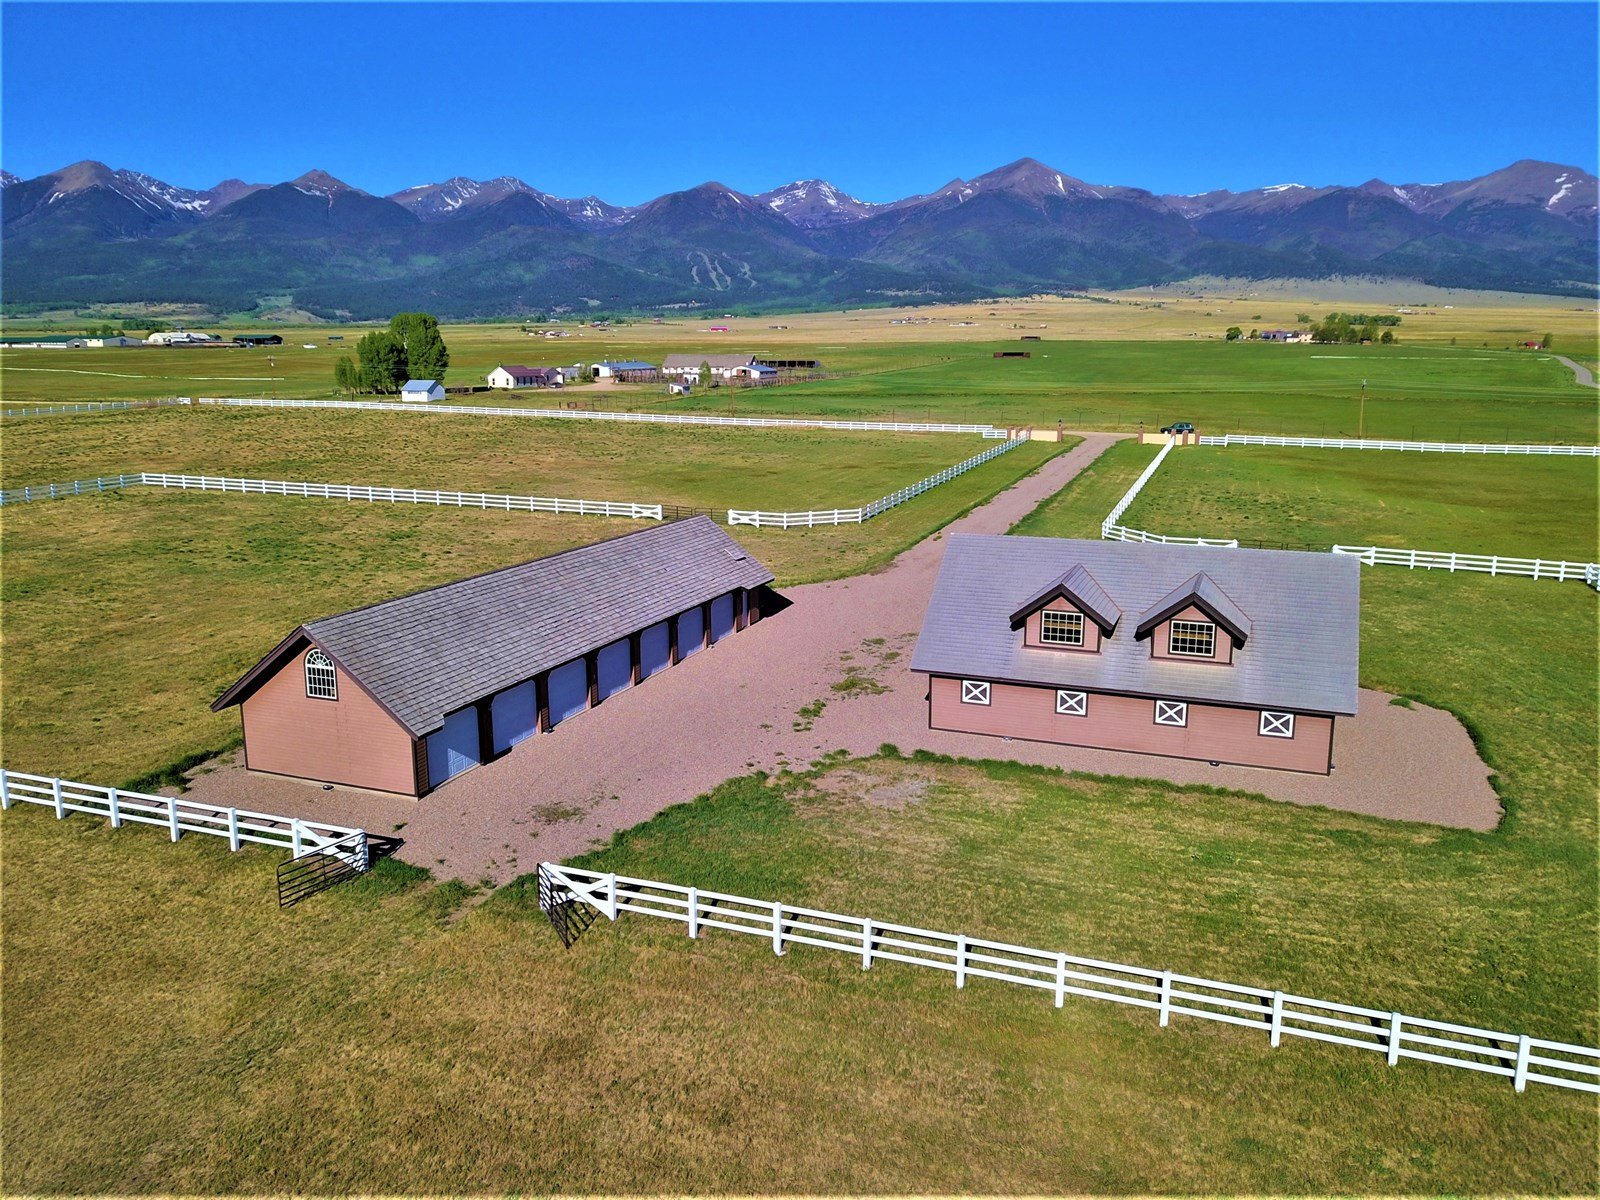 Stunningly Beautiful Horse Ranch in Westcliffe, Colorado